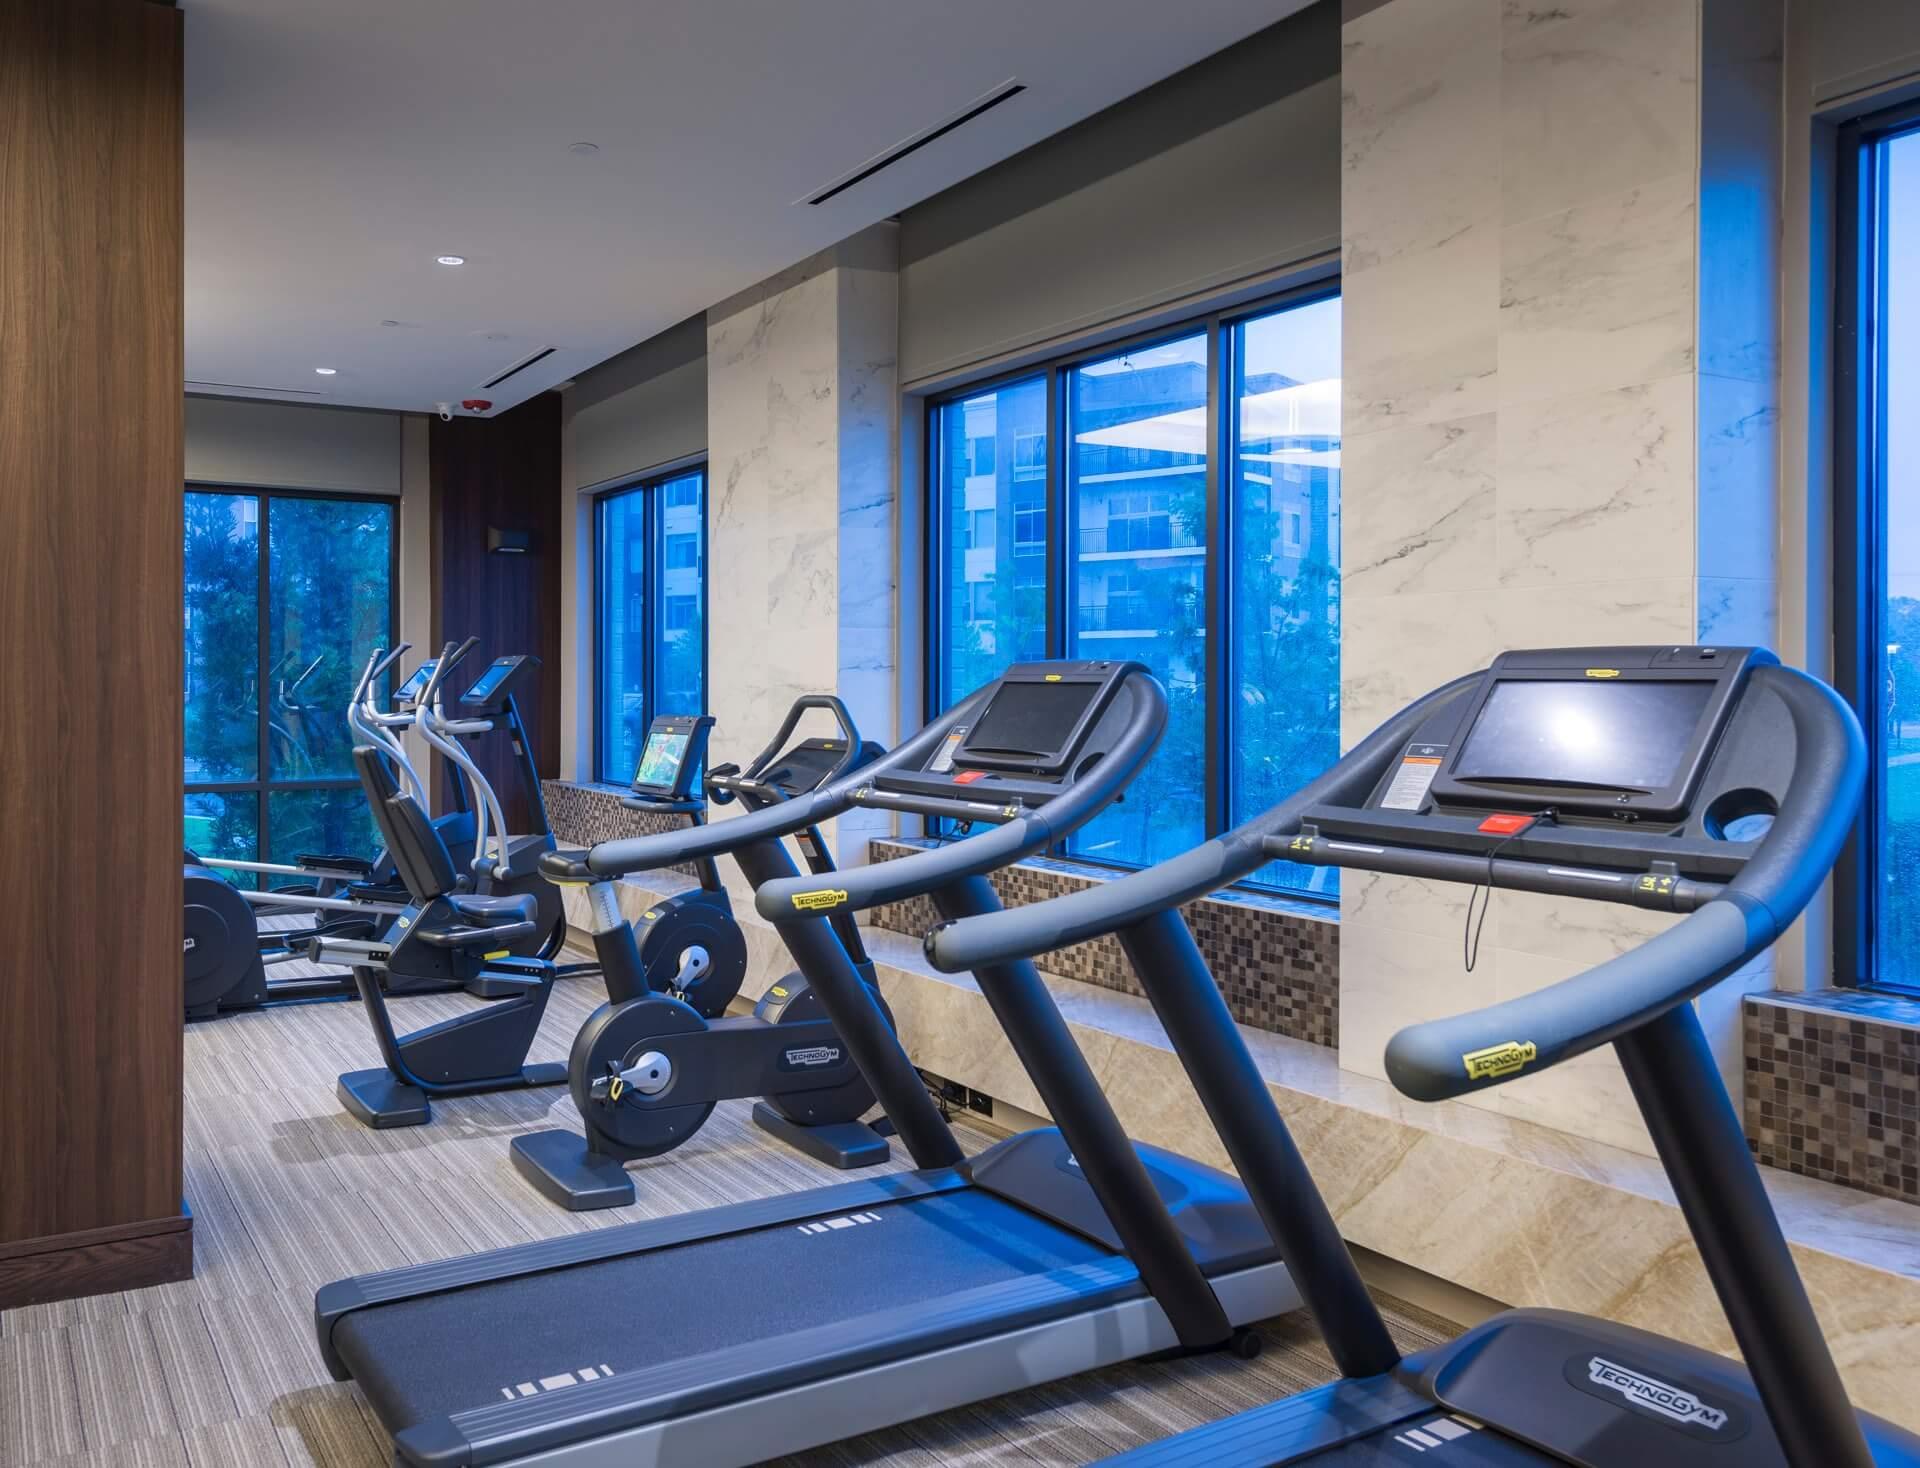 Fitness center with Peloton bikes & yoga room